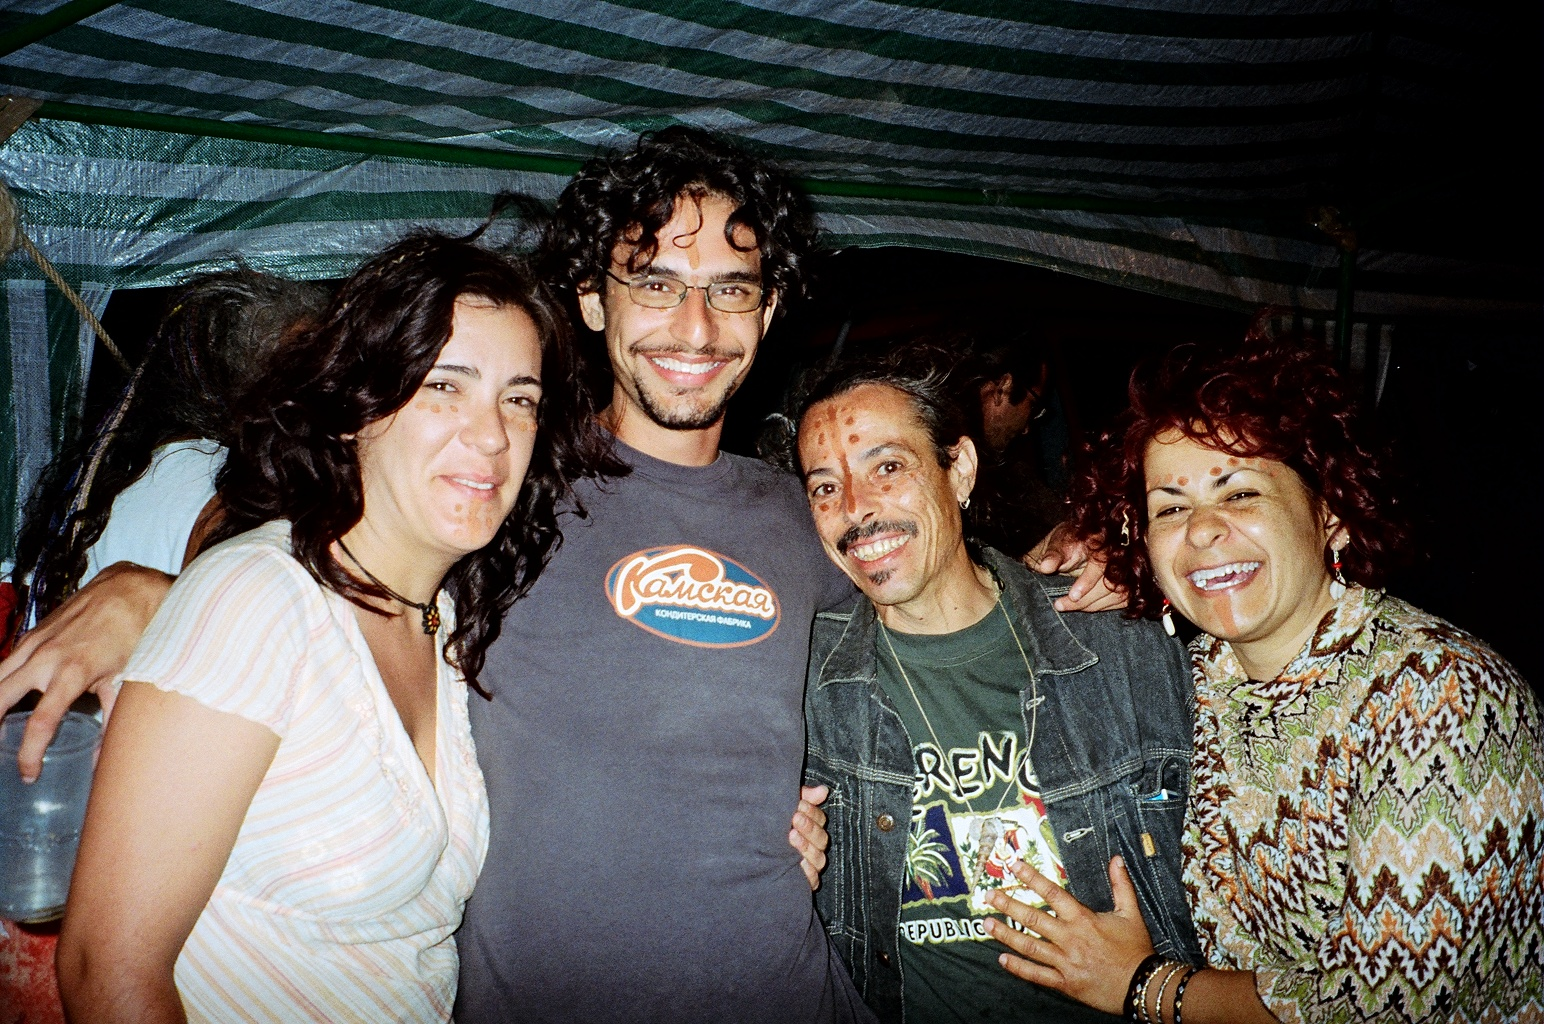 Beñesmer 2007